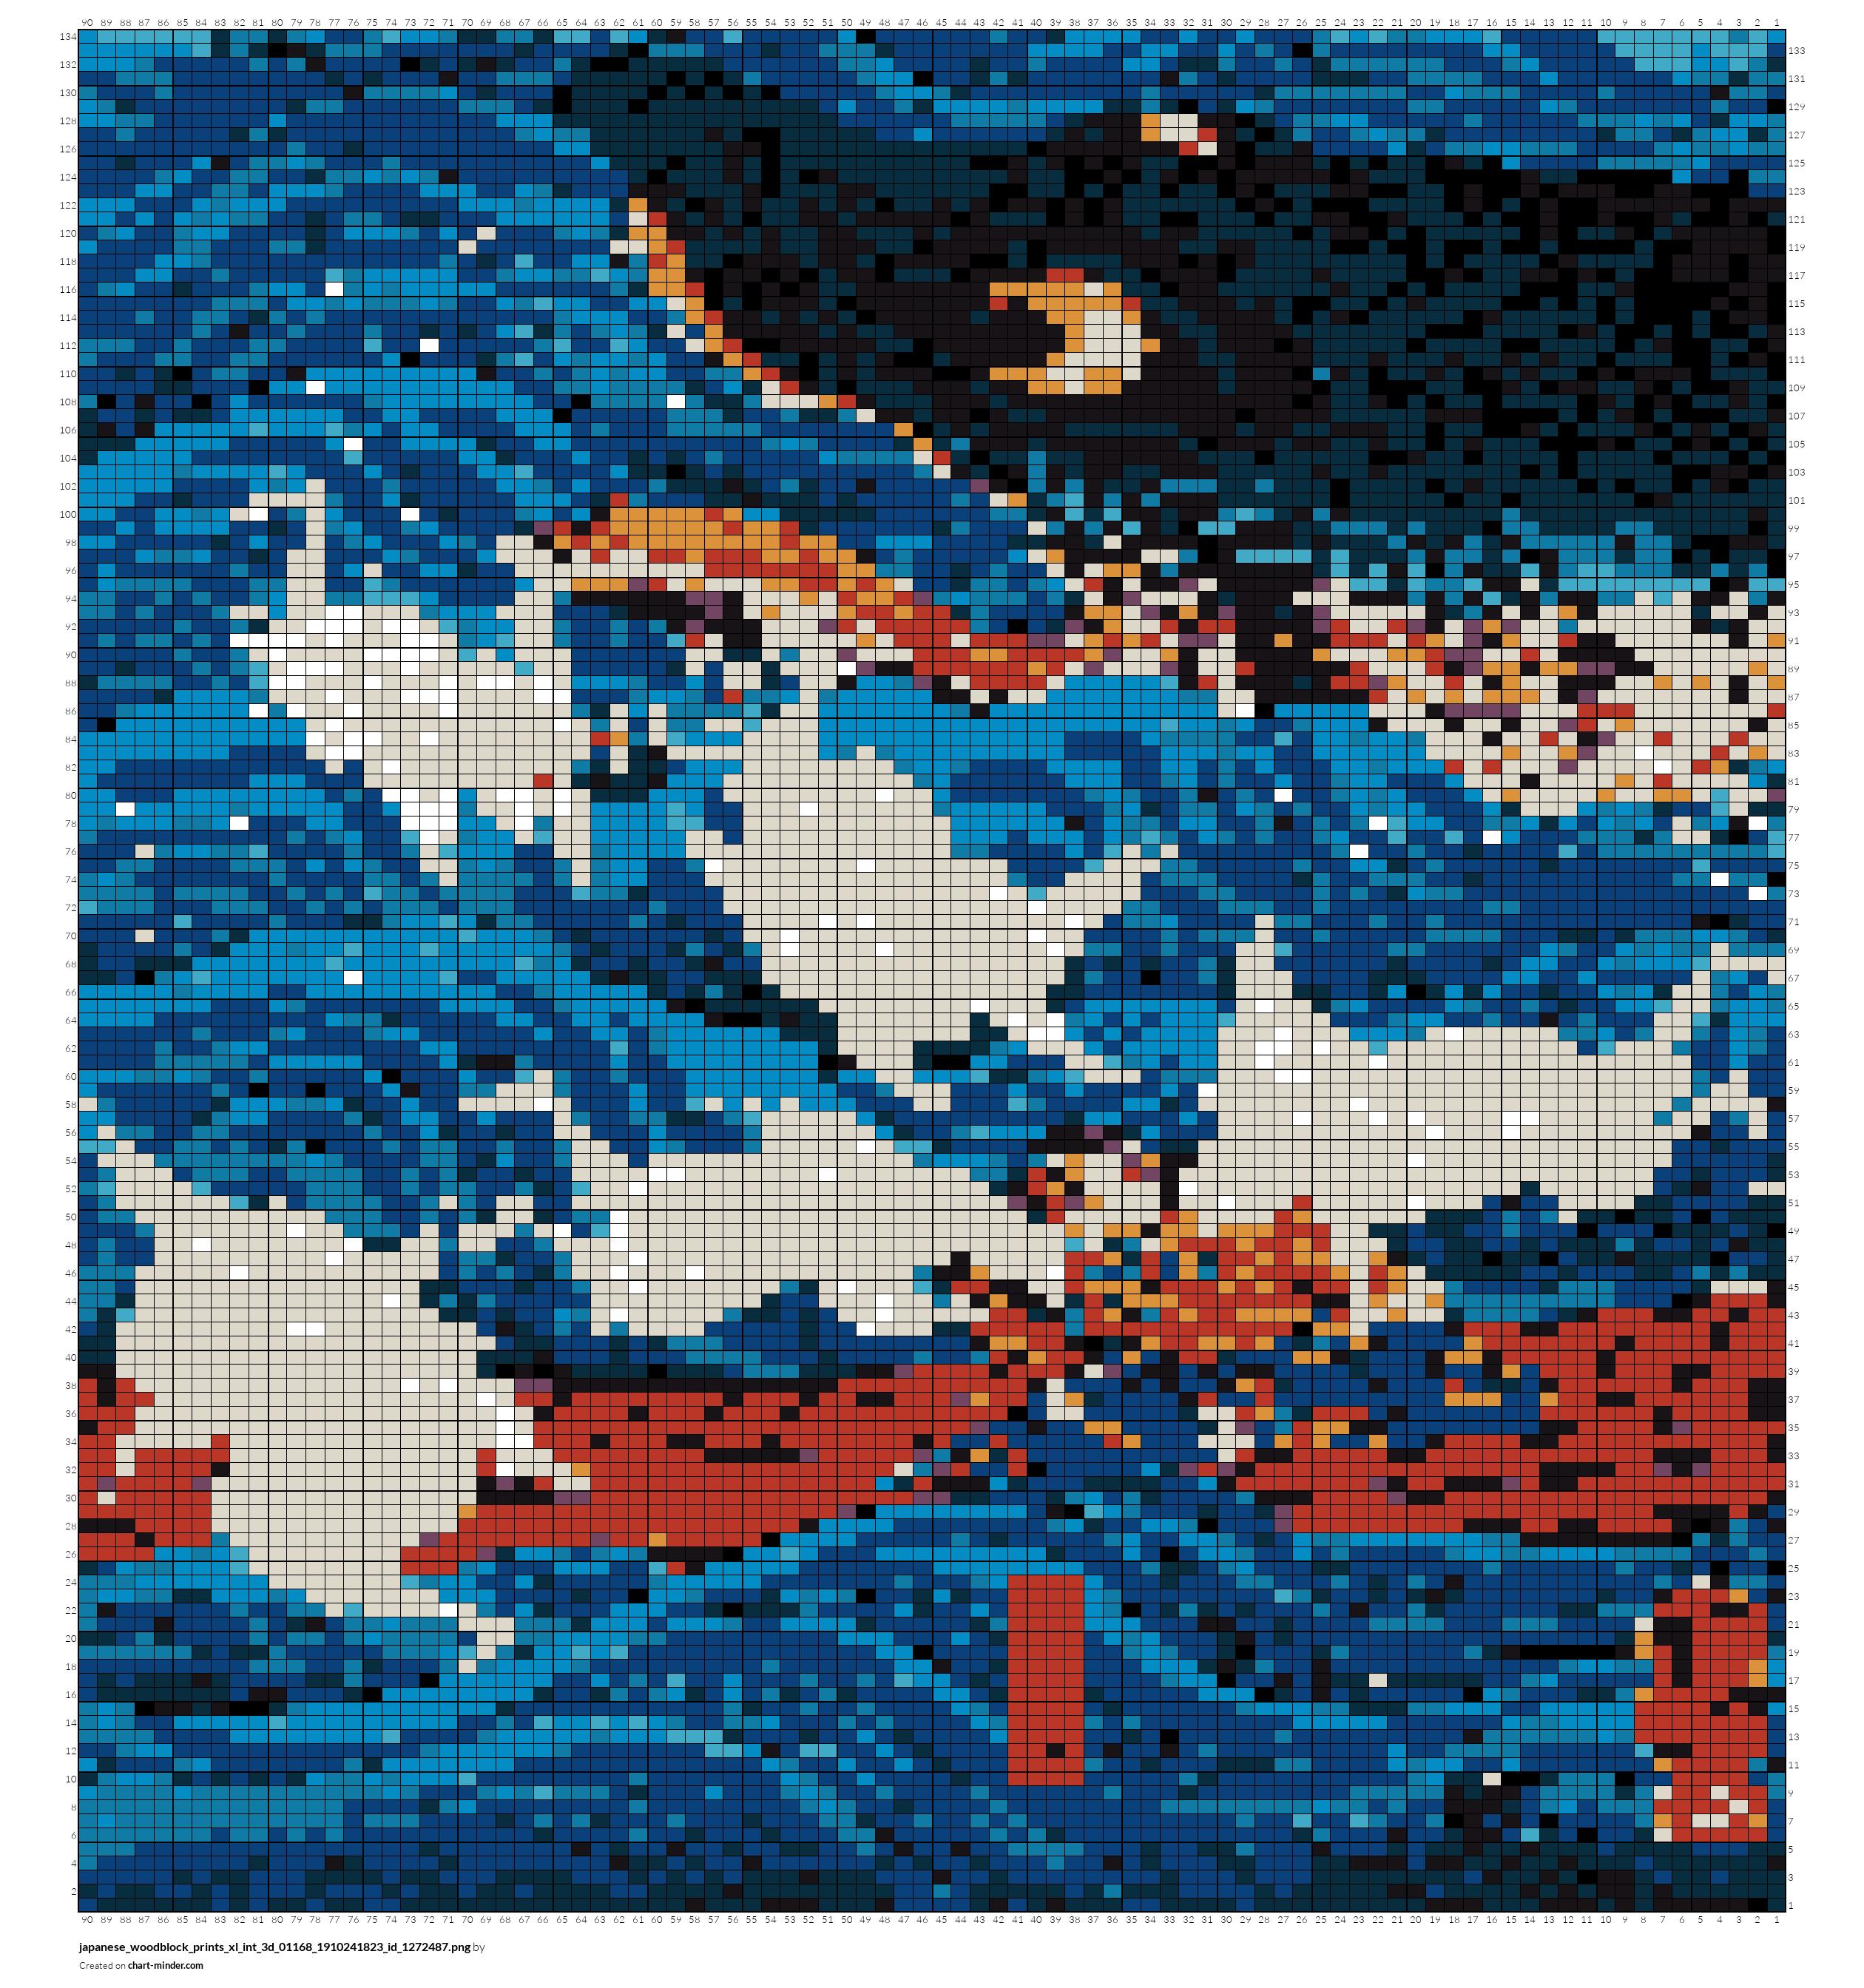 japanese_woodblock_prints_xl_int_3d_01168_1910241823_id_1272487.png